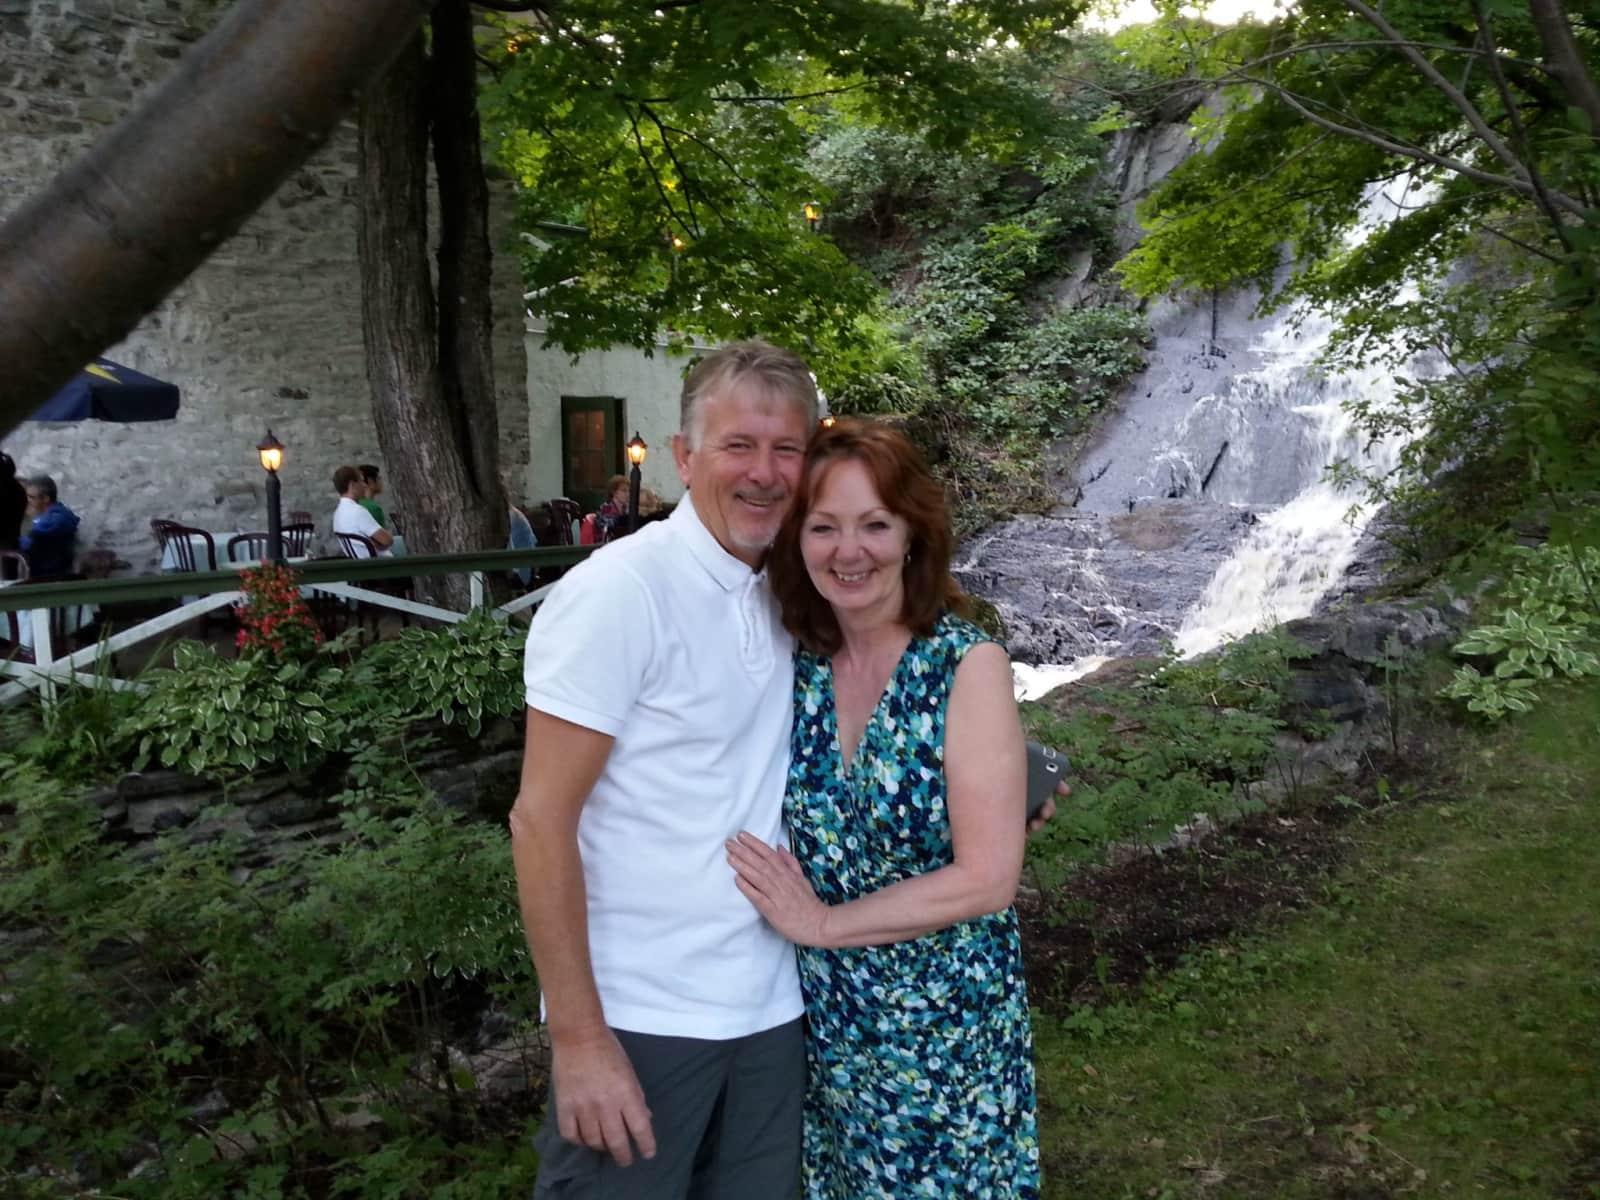 Ken & Joyce from Penticton, British Columbia, Canada